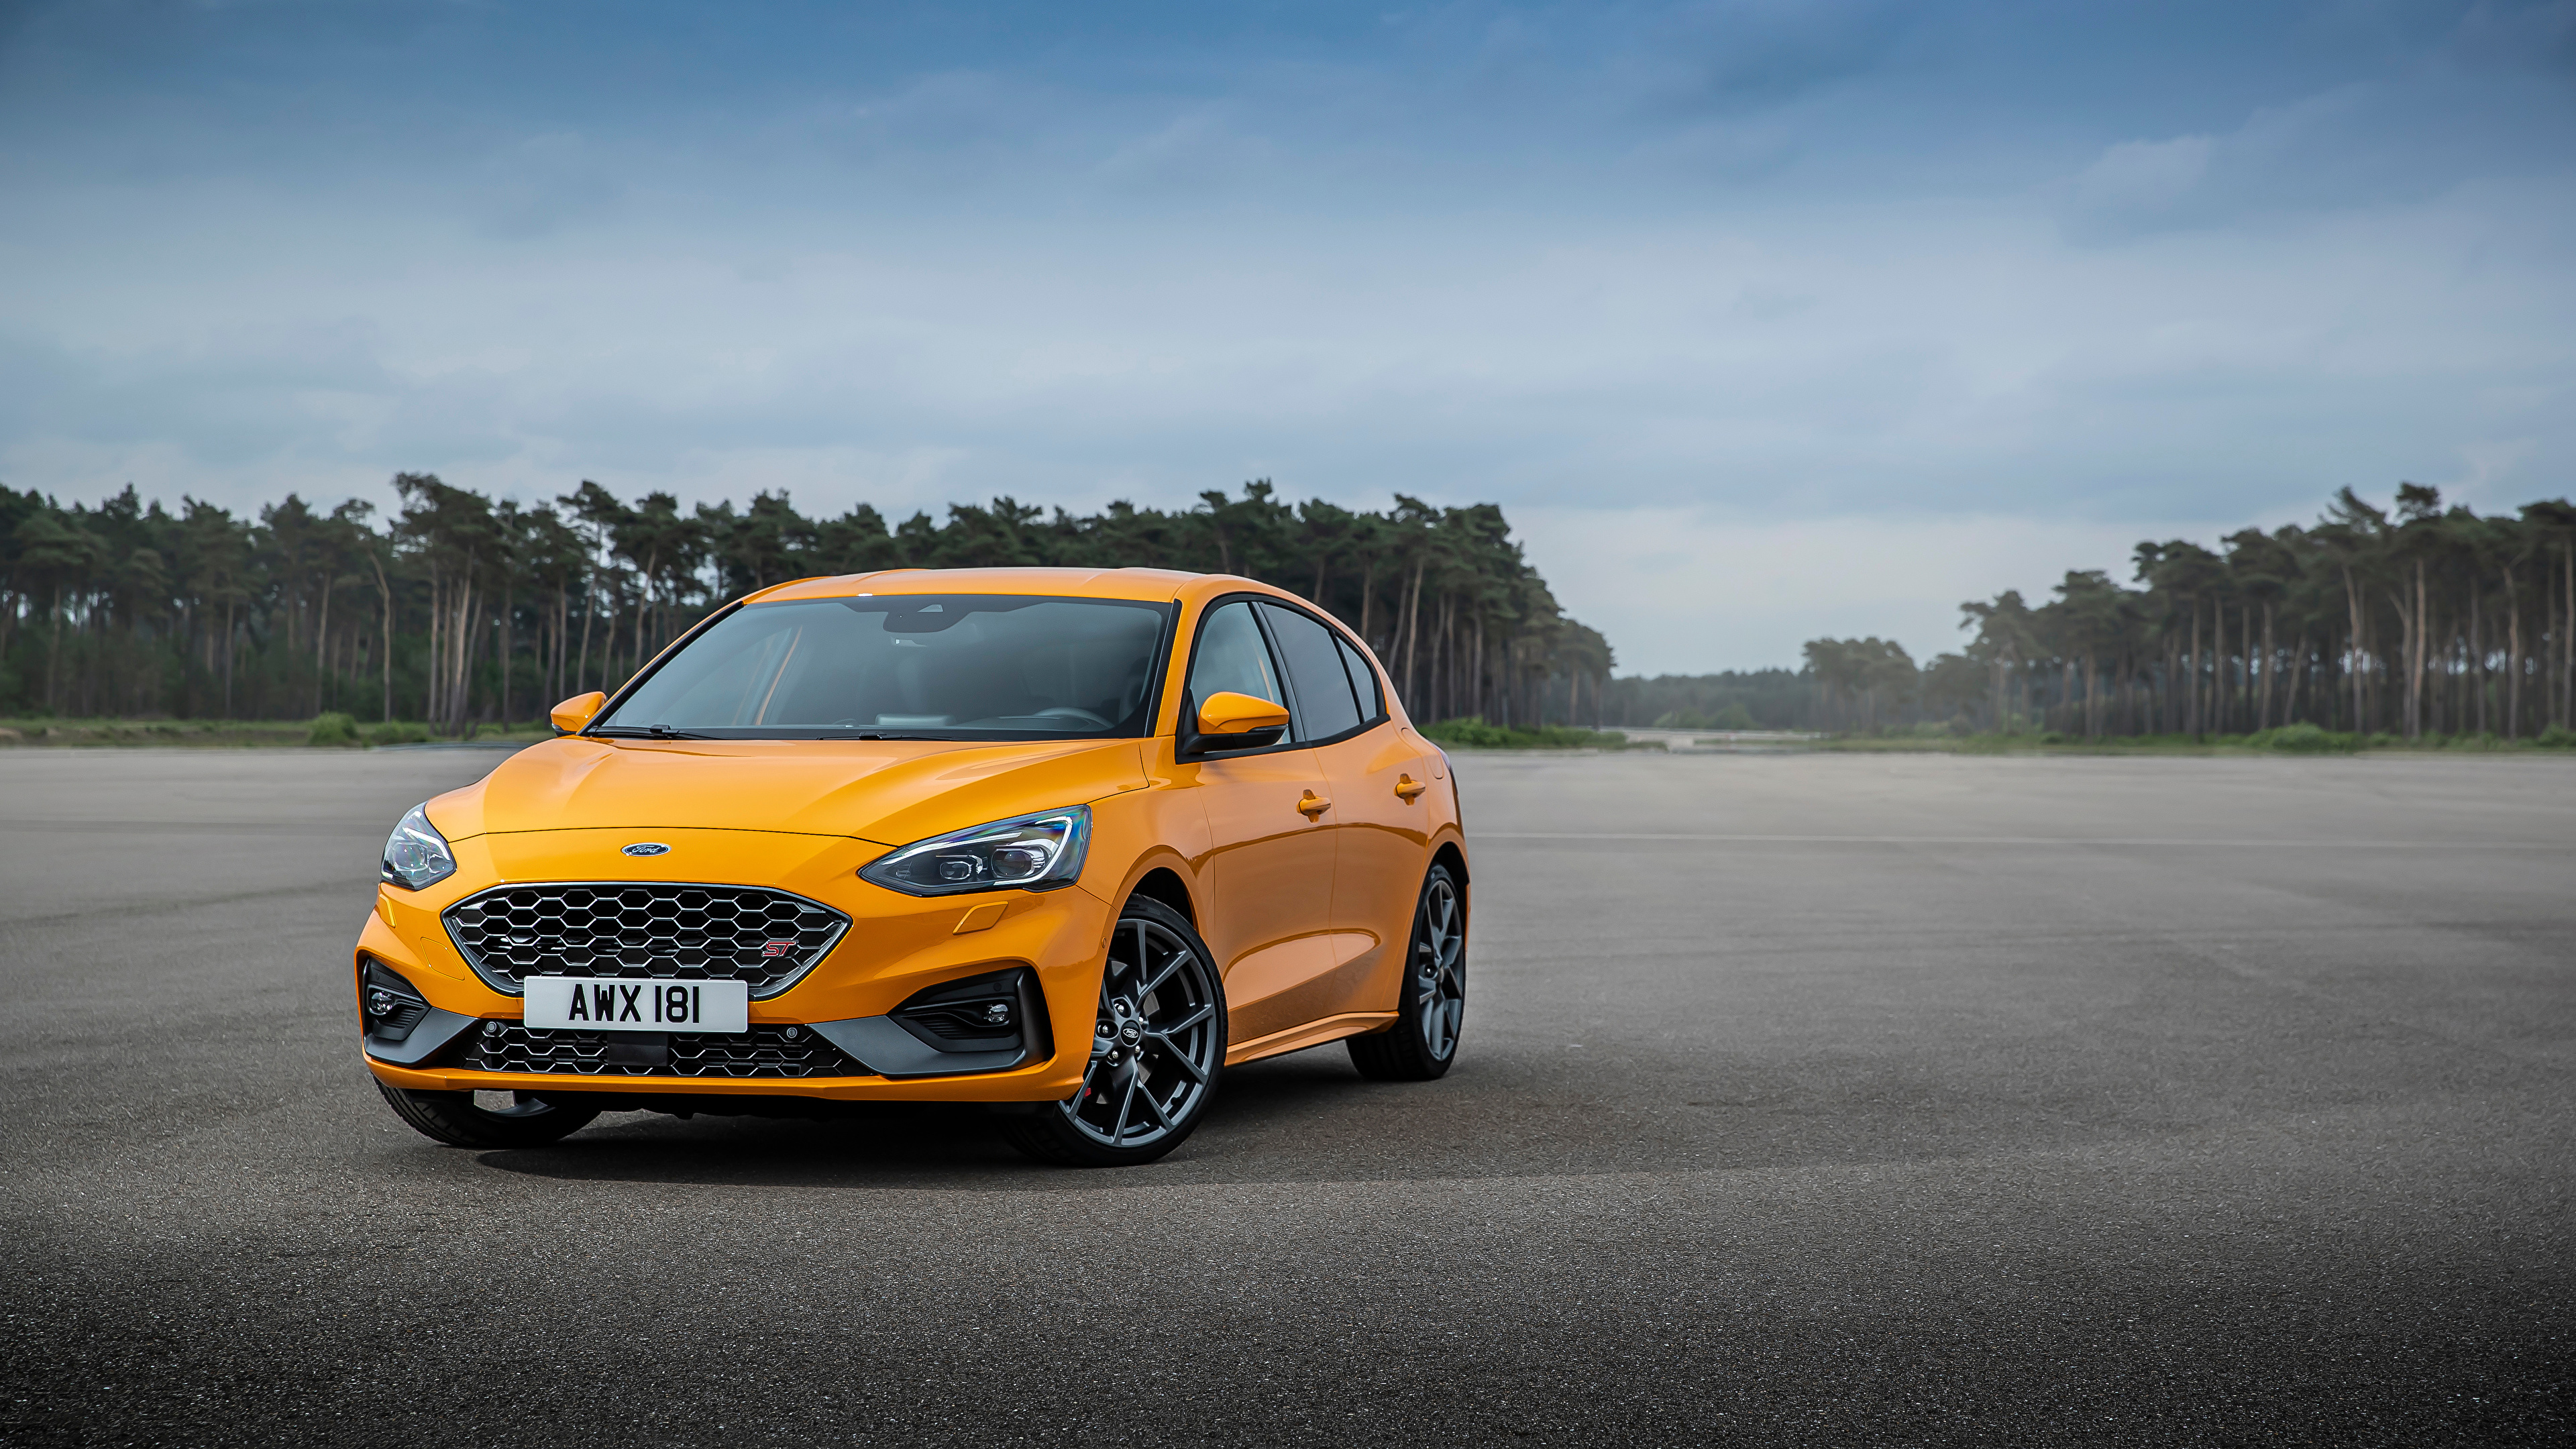 Wallpaper Ford Focus St Worldwide Orange Cars Metallic 3840x2160